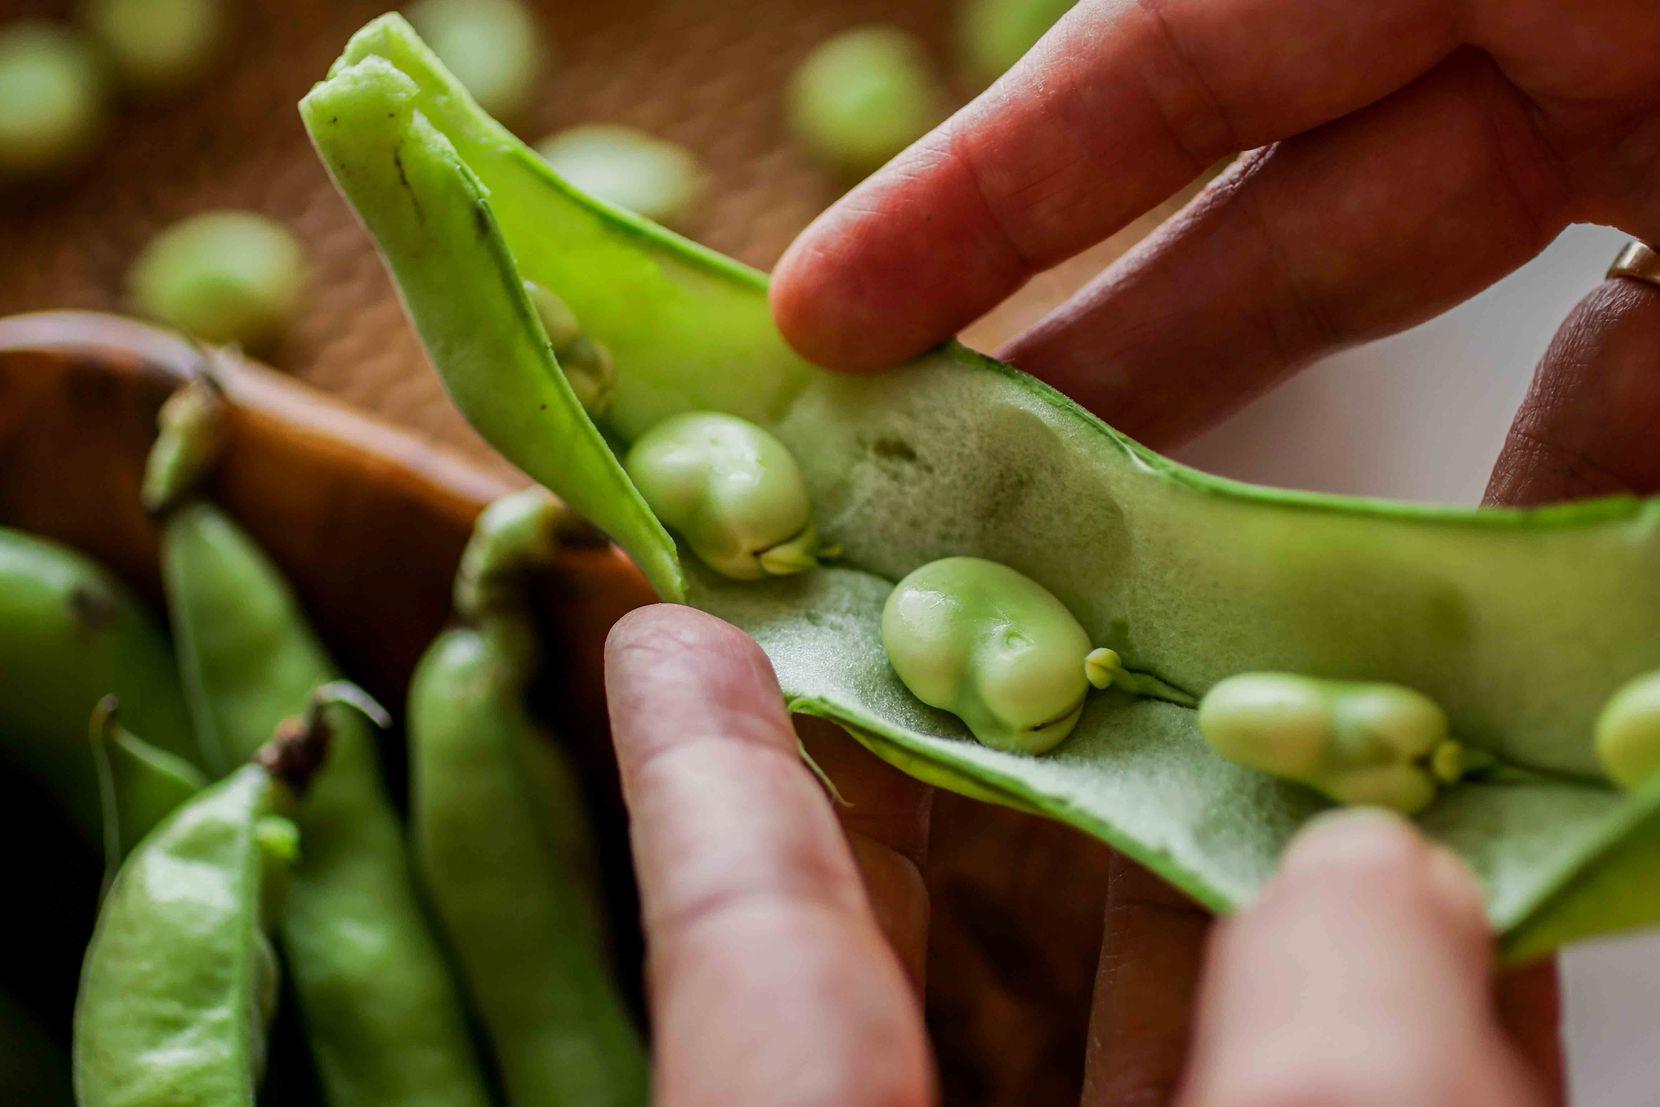 Fresh fava bean pod, opened at the seam